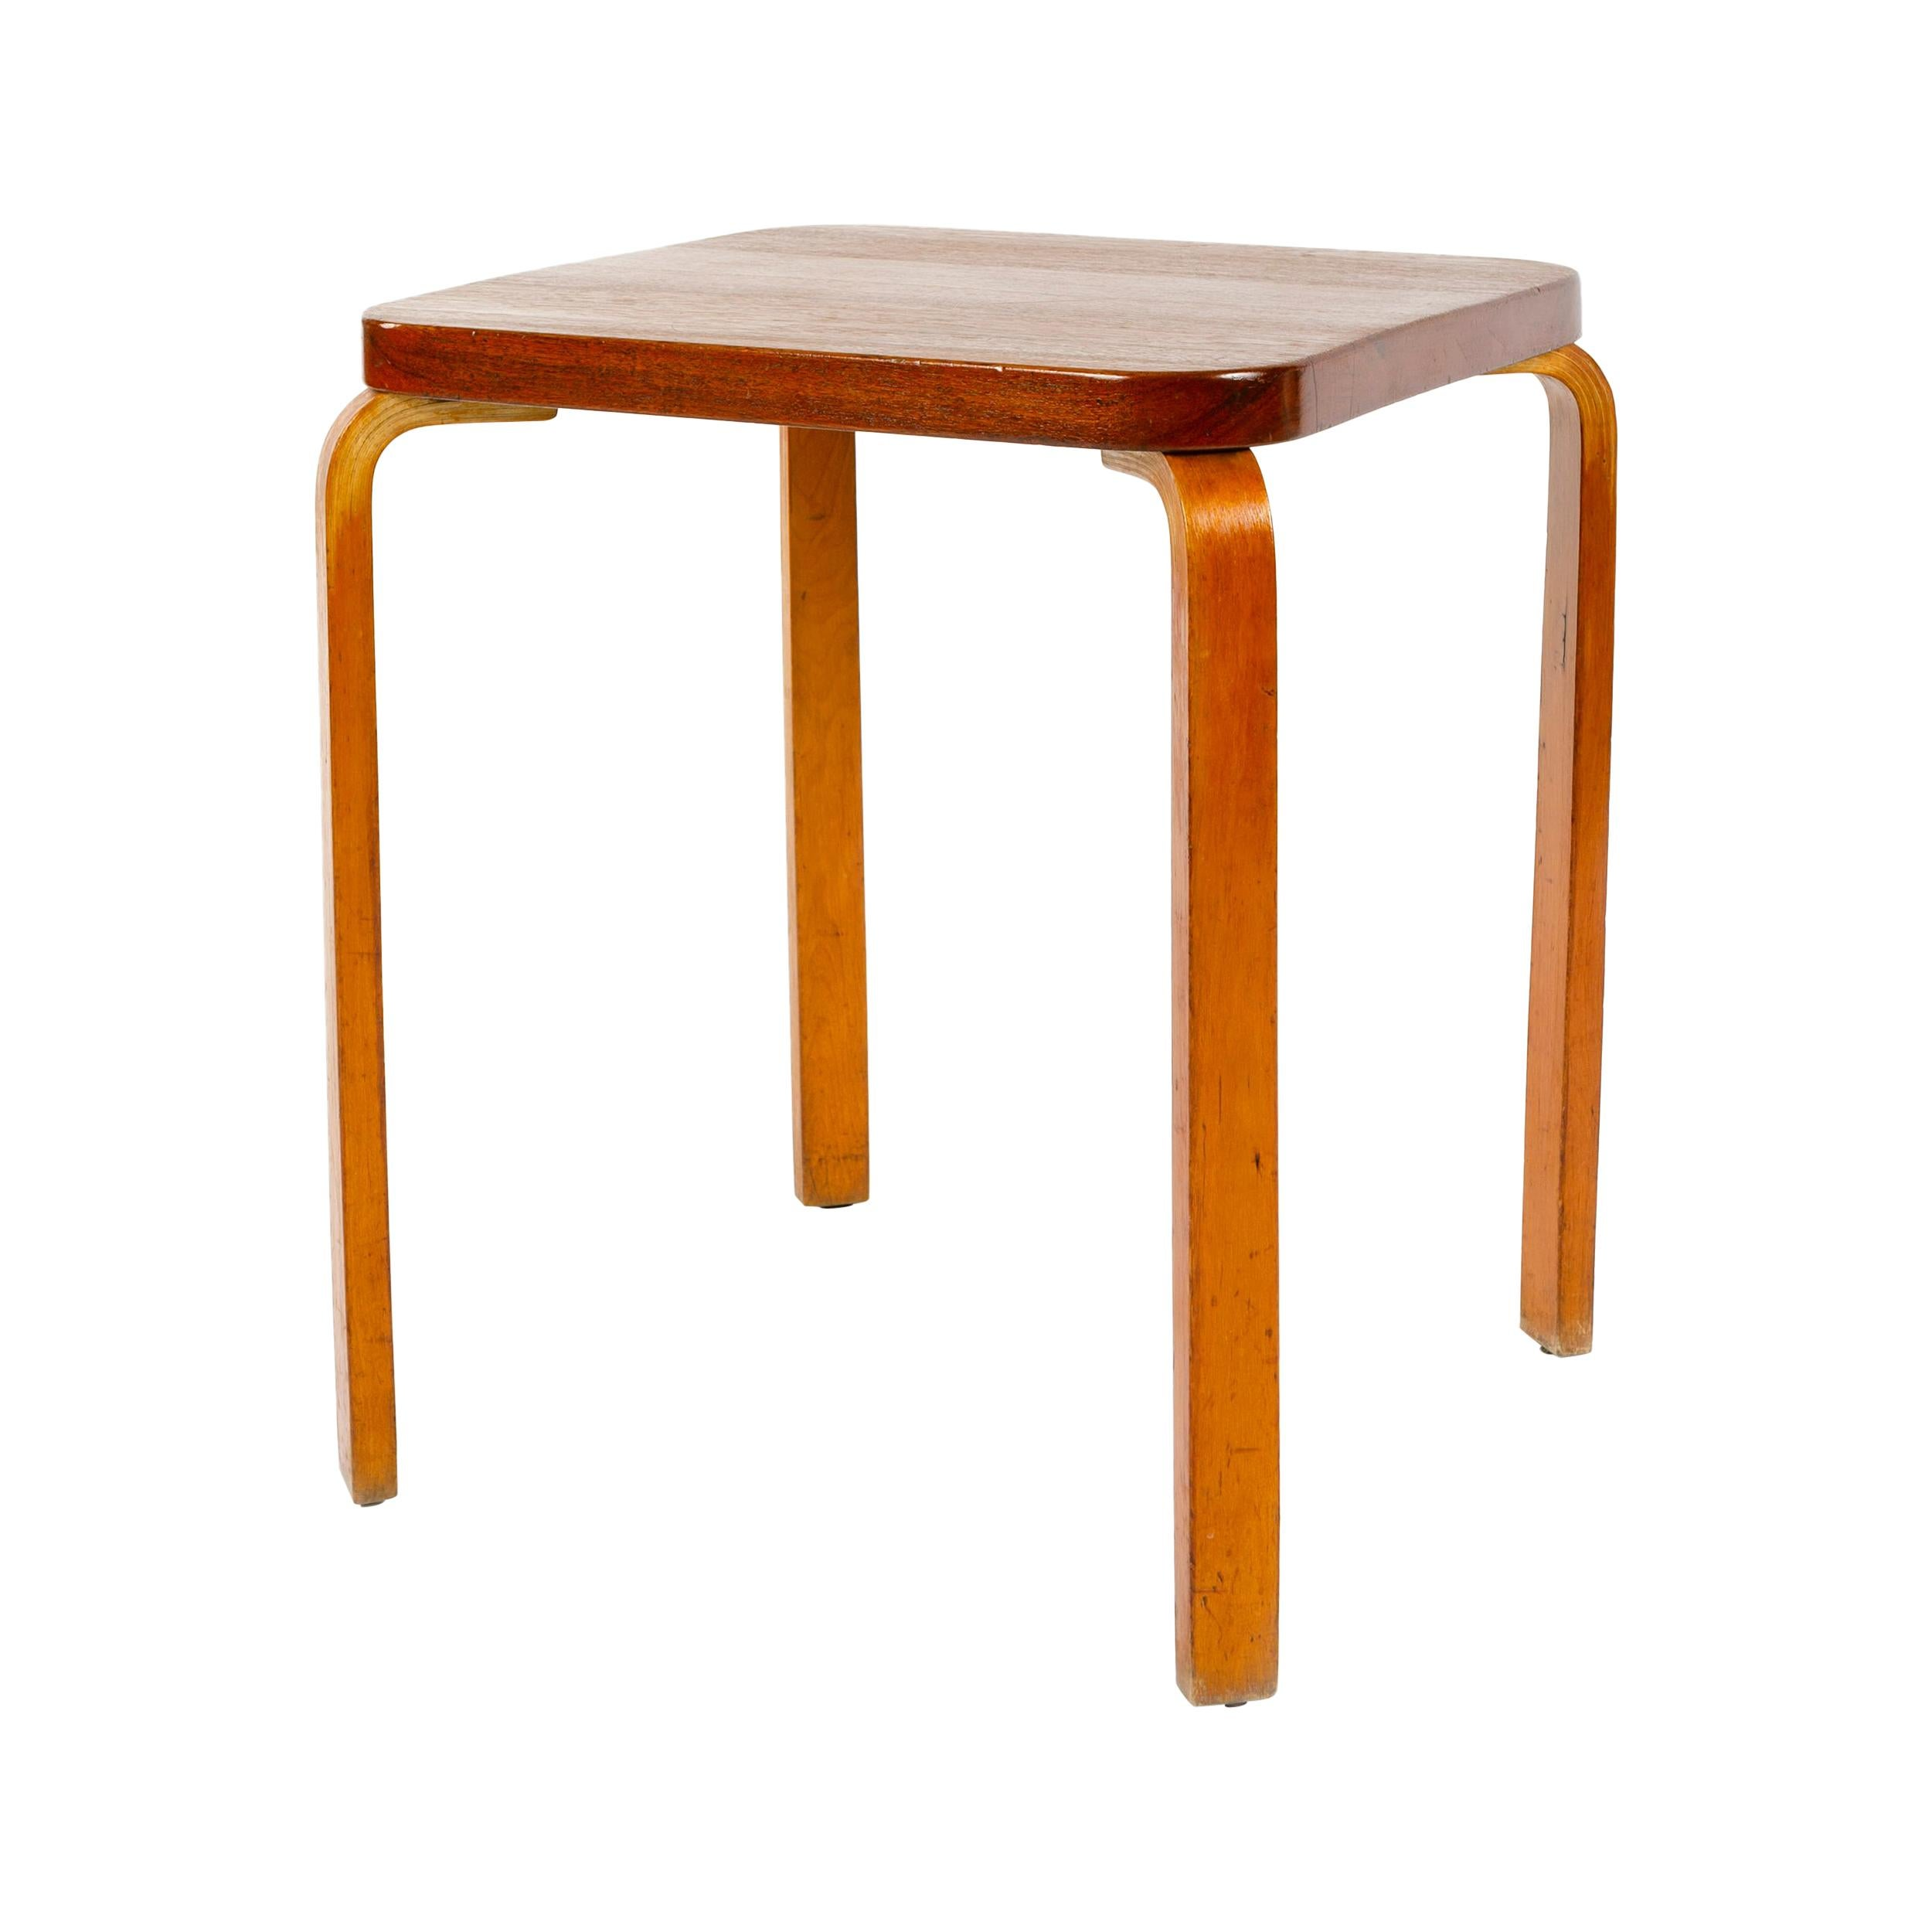 "1930s Finnish ""World's Fair"" Table by Alvar Aalto for Artek"